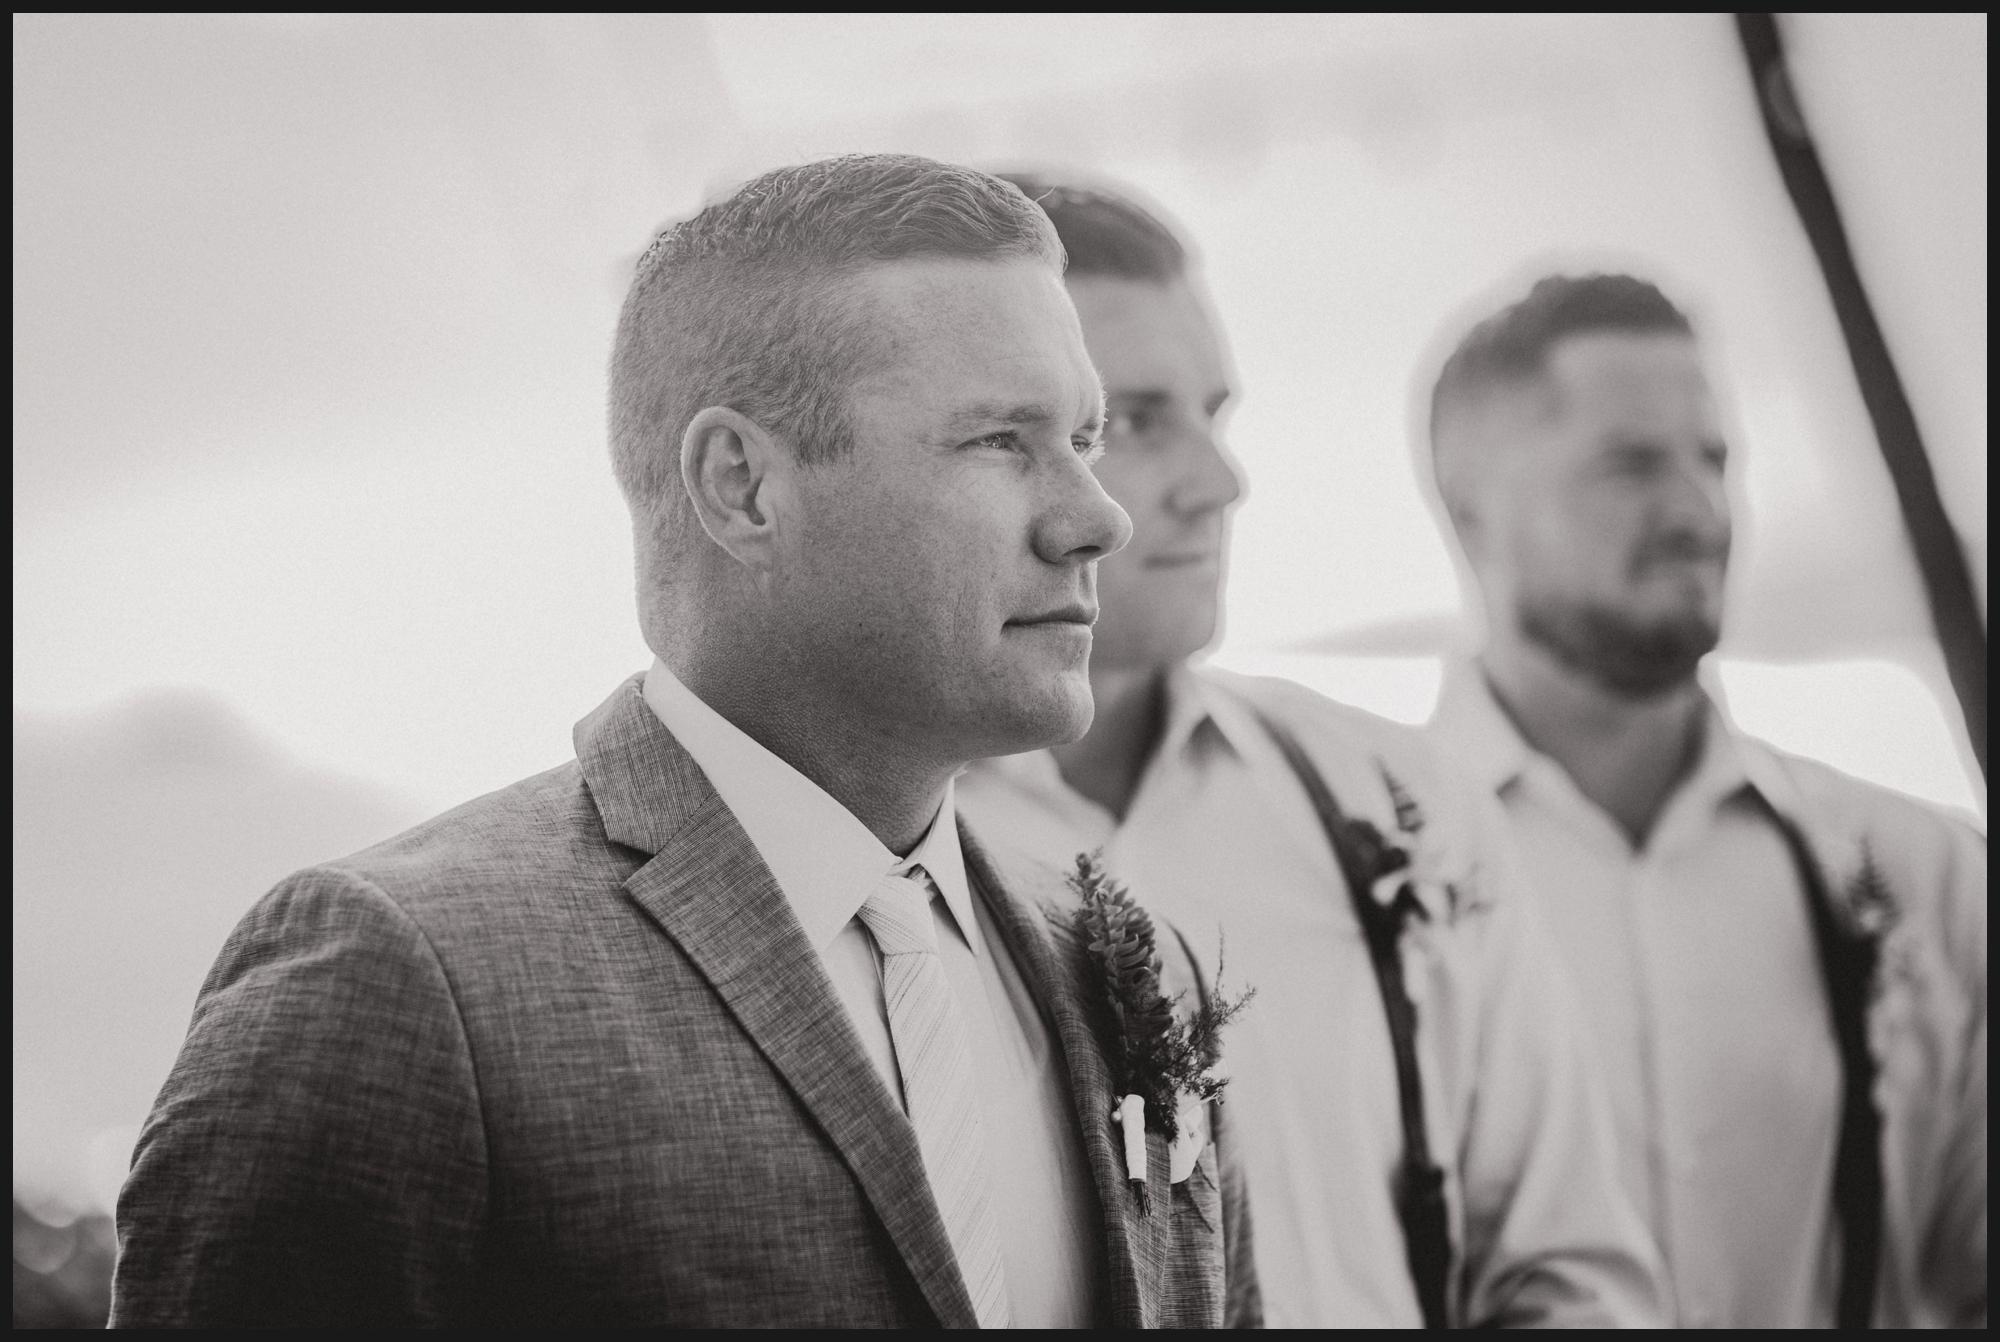 Orlando-Wedding-Photographer-destination-wedding-photographer-florida-wedding-photographer-hawaii-wedding-photographer_0053.jpg